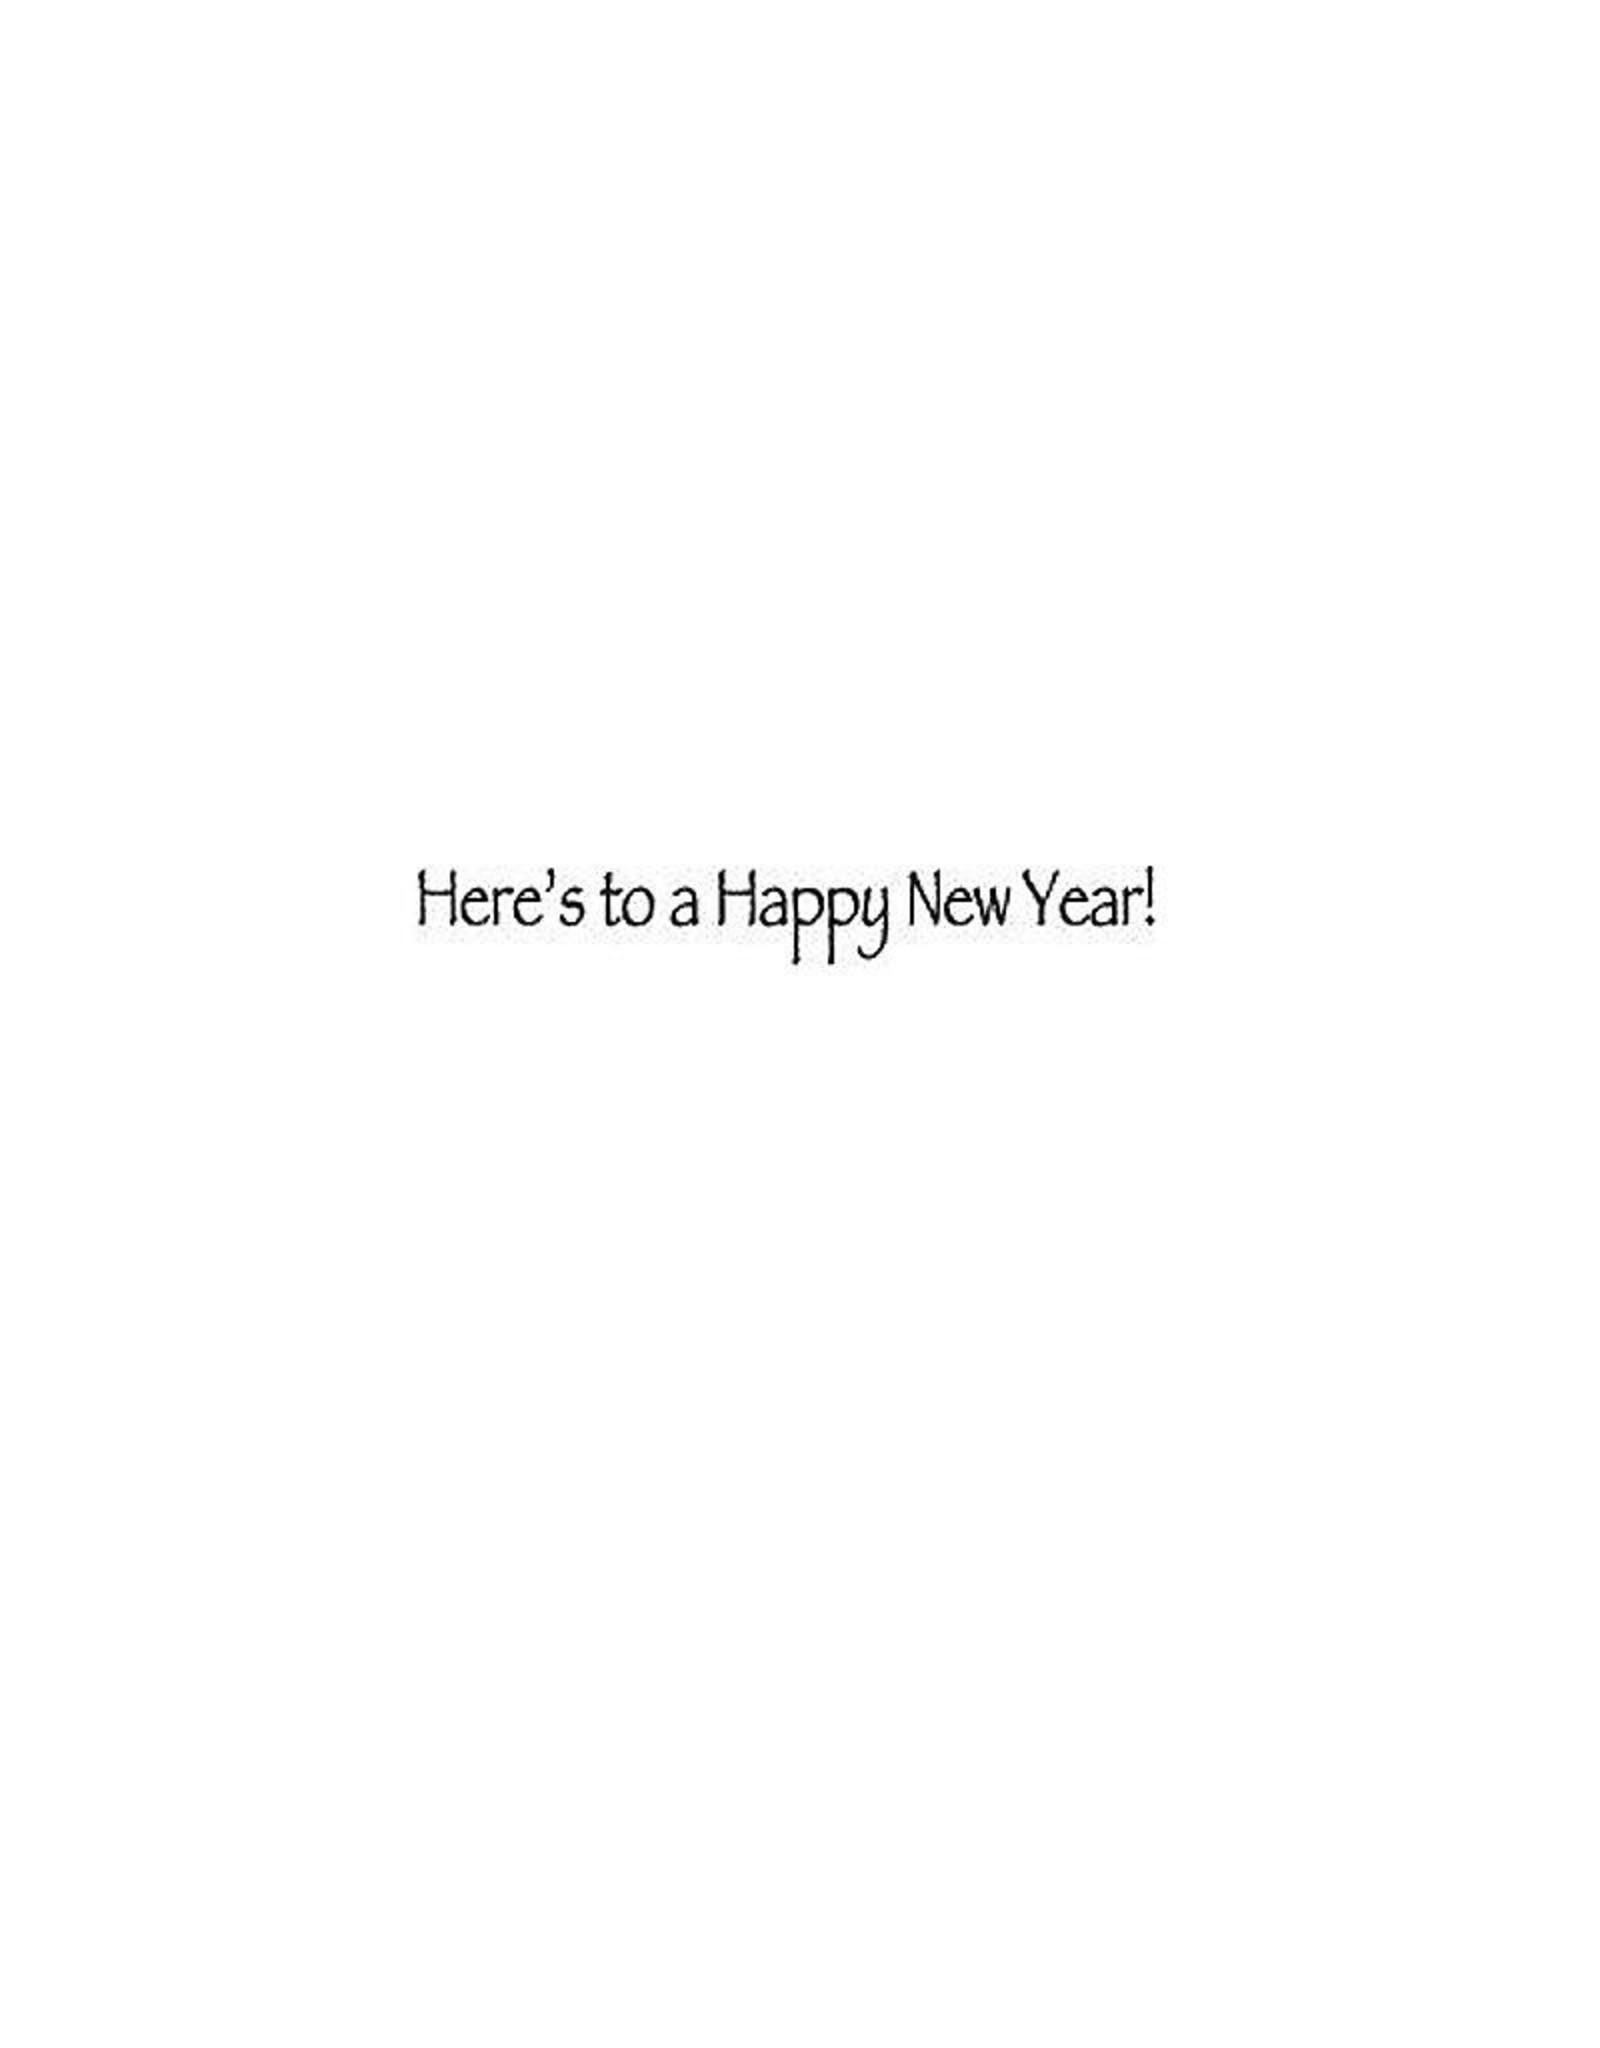 Caspari New Years Card Champagne Glasses And Fireworks